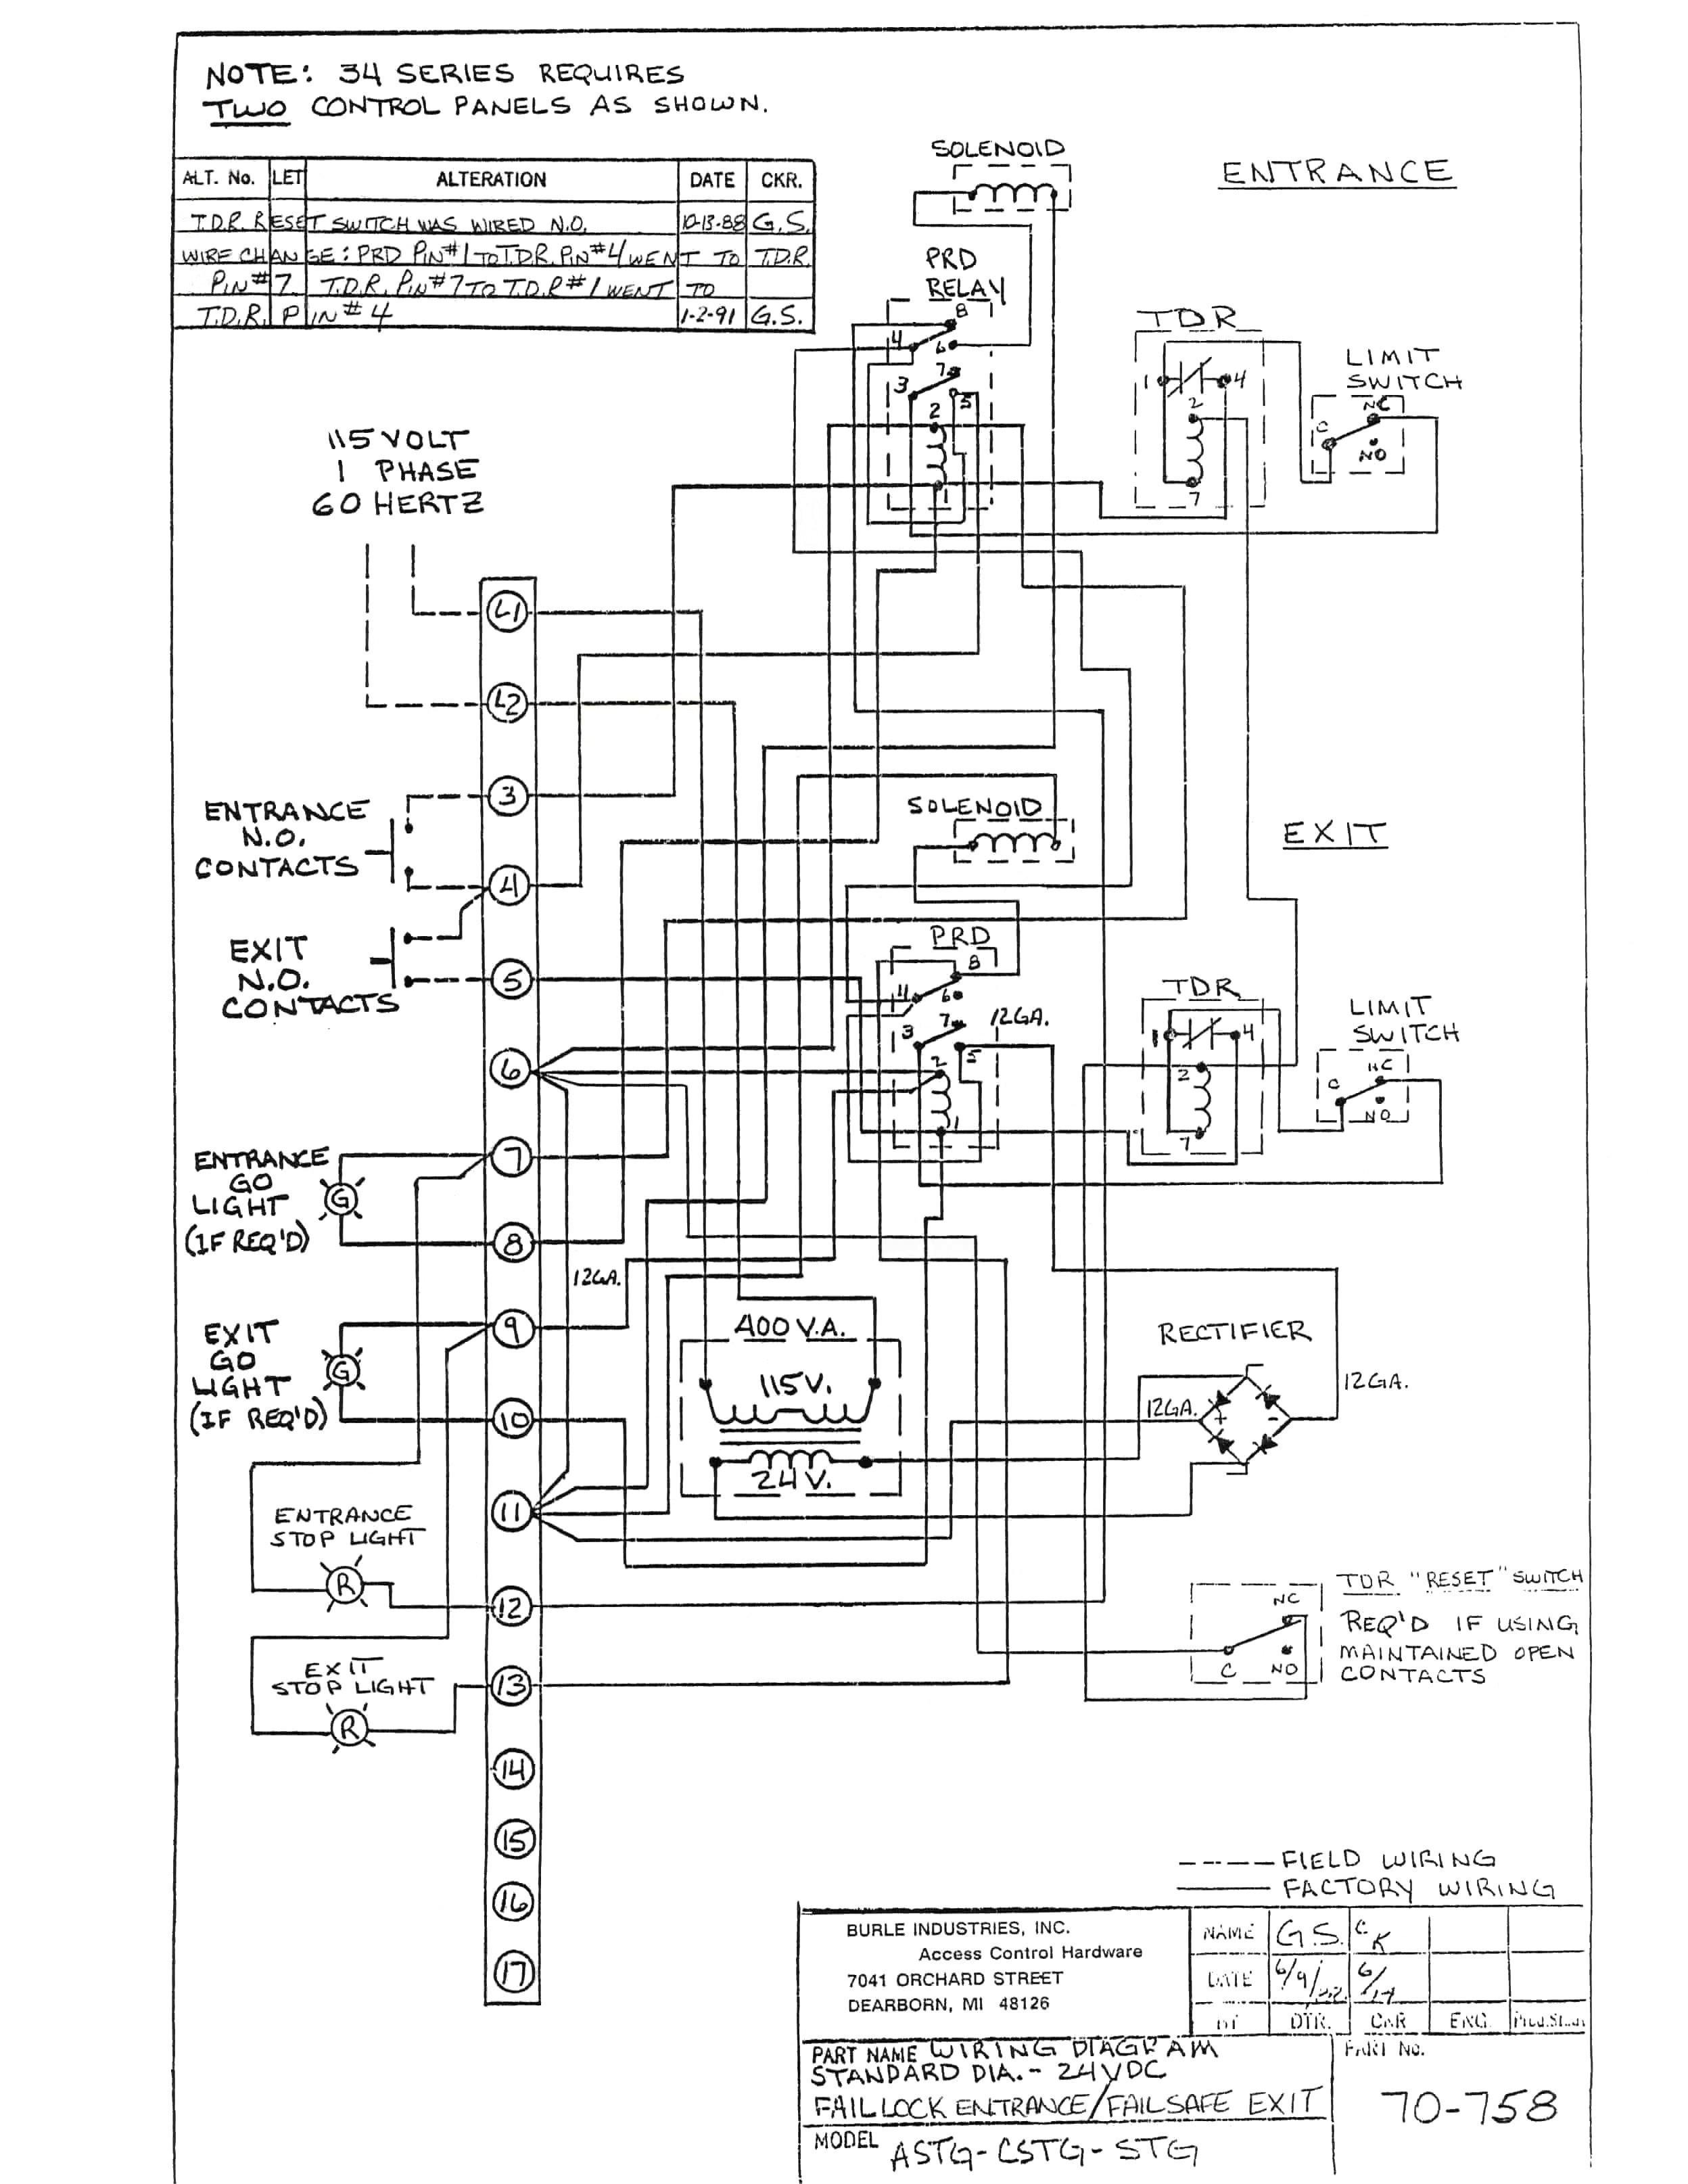 stryker golight wiring diagram wire center u2022 rh lsoncology co